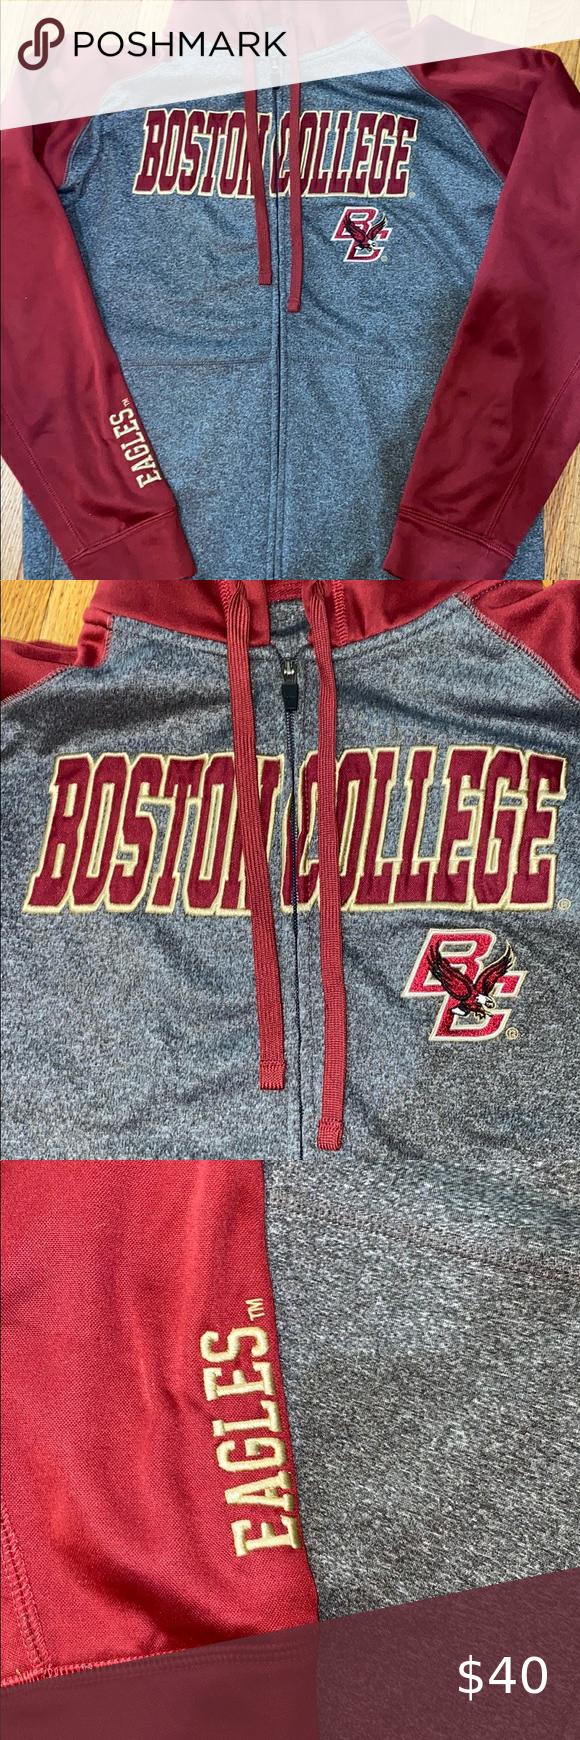 Champion Boston College Zip Up Hoodie Medium In 2021 Mens Champion Hoodie Mens Sweatshirts Hoodie Champion Pullover Hoodie [ 1740 x 580 Pixel ]